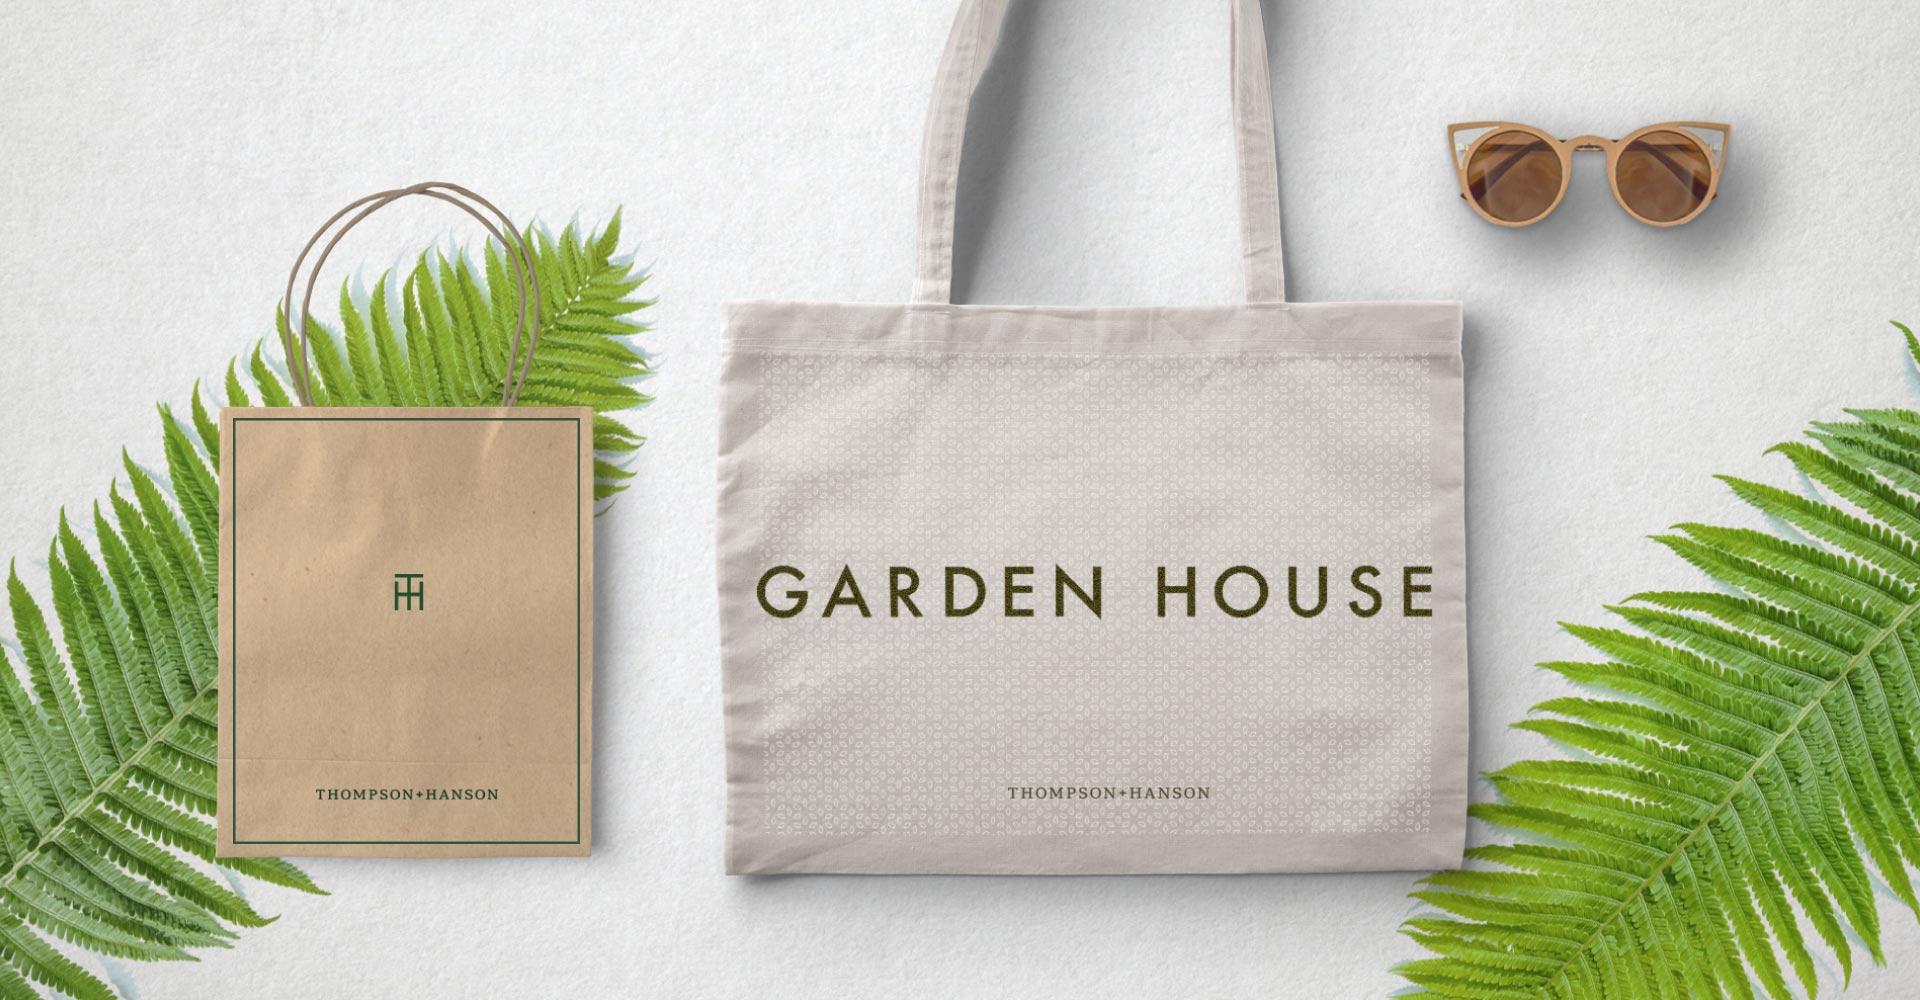 Creative_Retail_Packaging_Thompson_Hanson_Branding_10.jpg